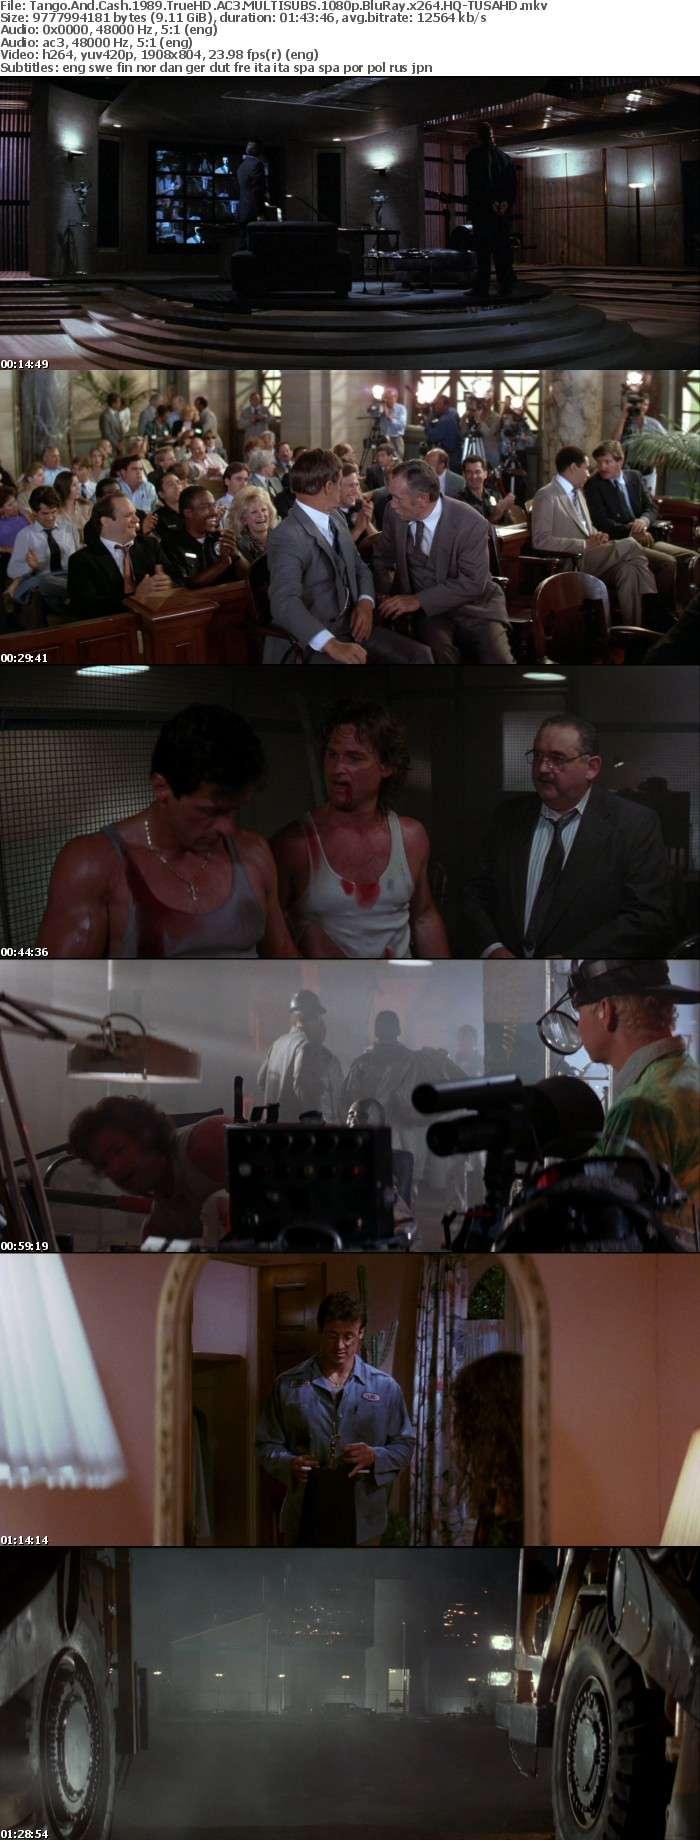 Tango And Cash 1989 TrueHD AC3 MULTISUBS 1080p BluRay x264 HQ-TUSAHD